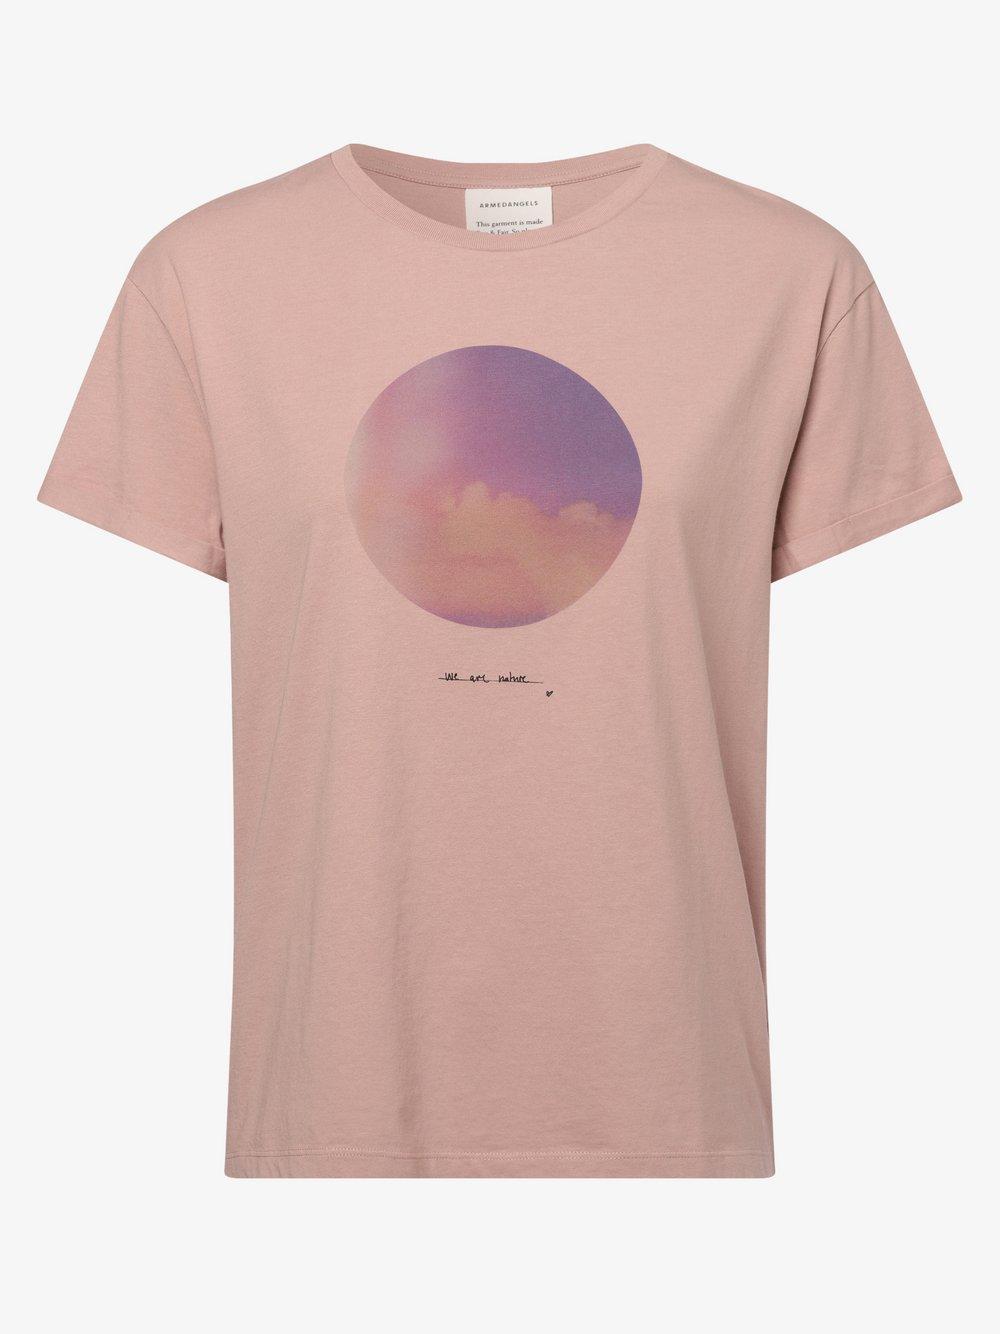 ARMEDANGELS - T-shirt damski – Naalin, różowy